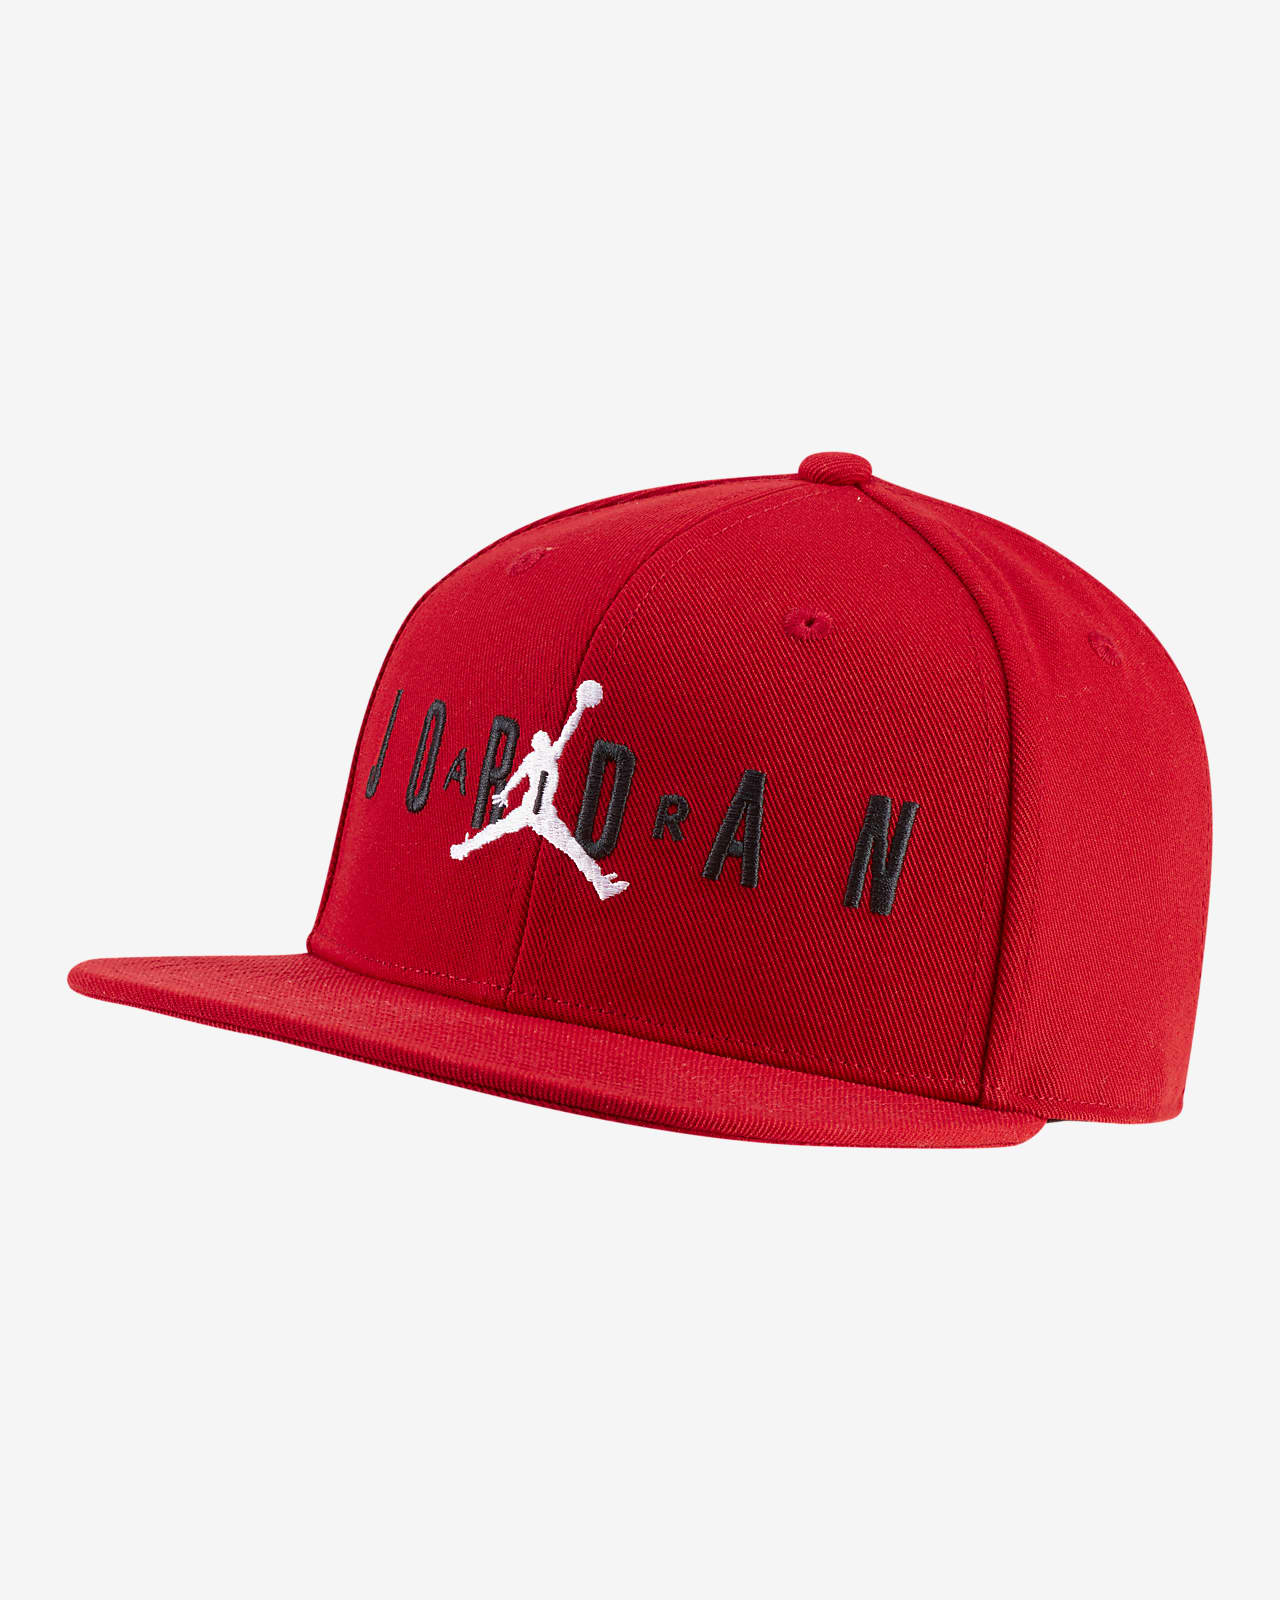 Jordan Jumpman verstellbare Cap für ältere Kinder